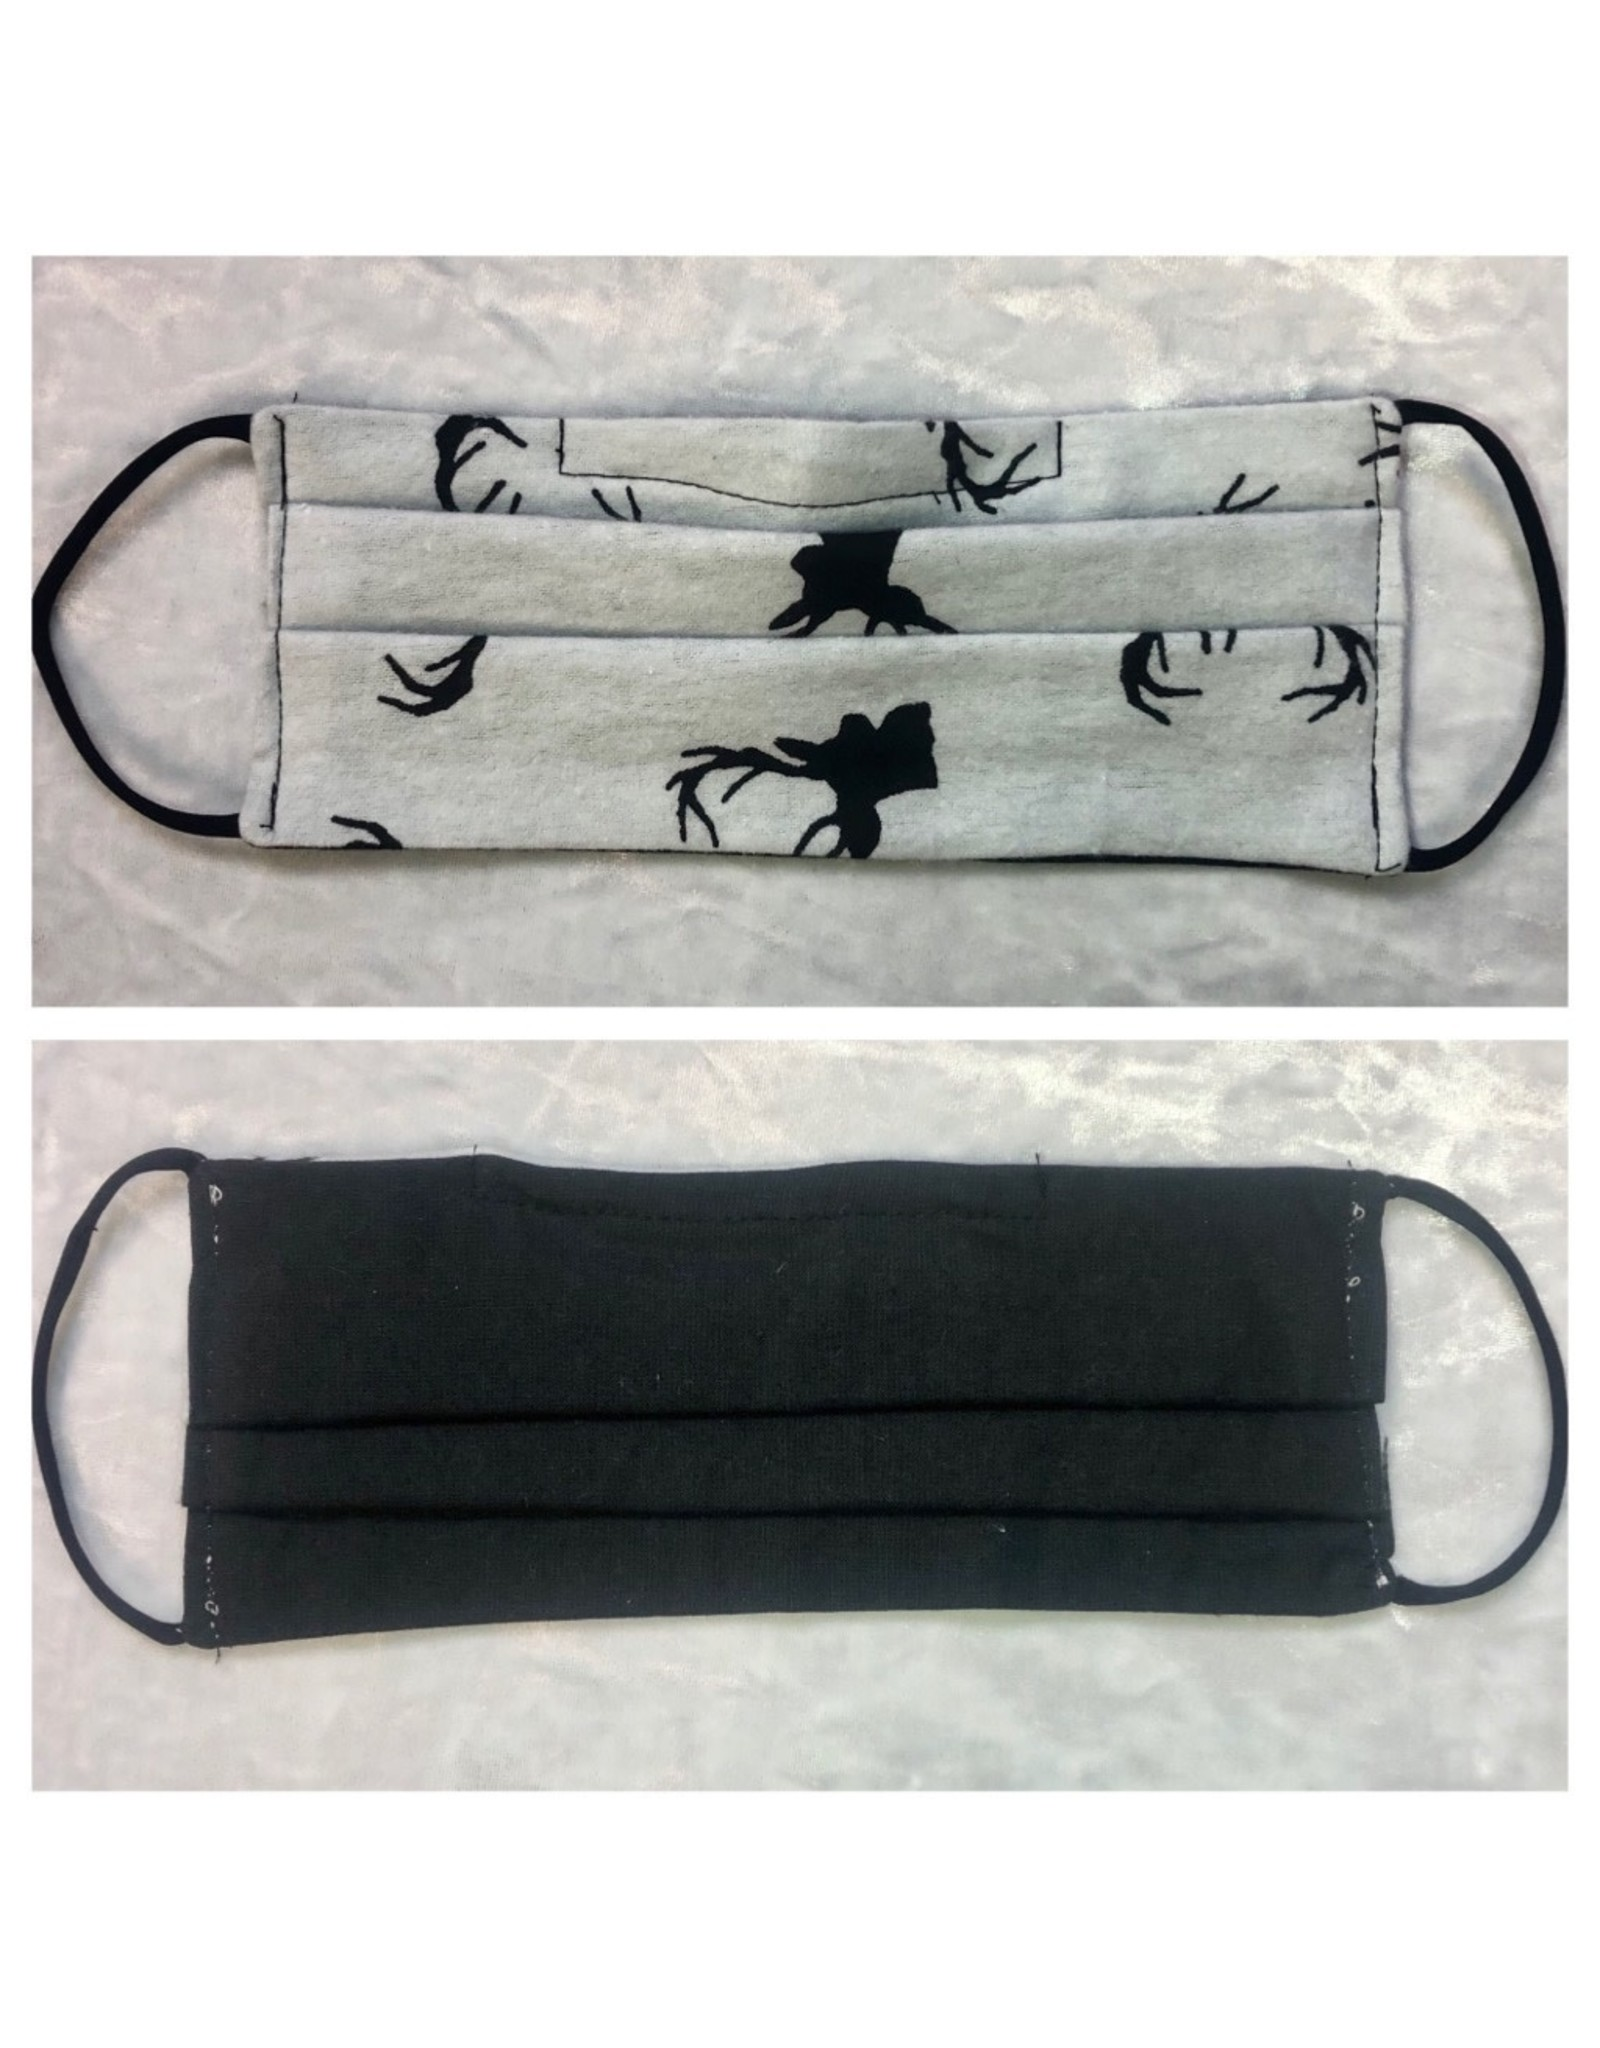 Karries Kostumes Lrg Fabric Face Mask - Grey Deer